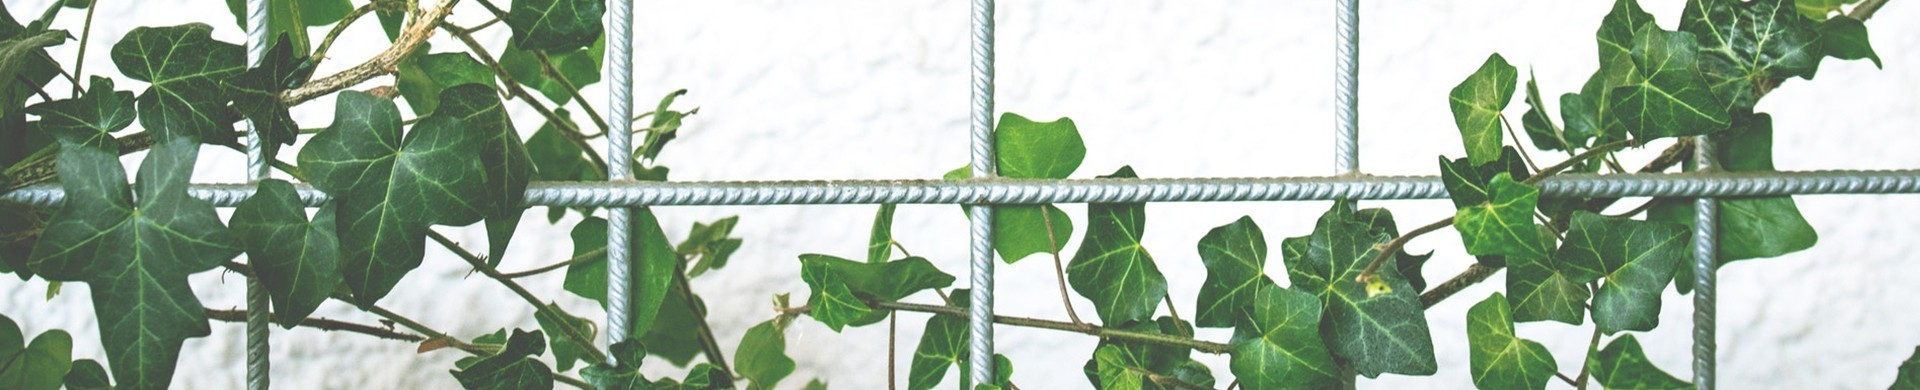 Garden Accessories - Buy Garden Accessories